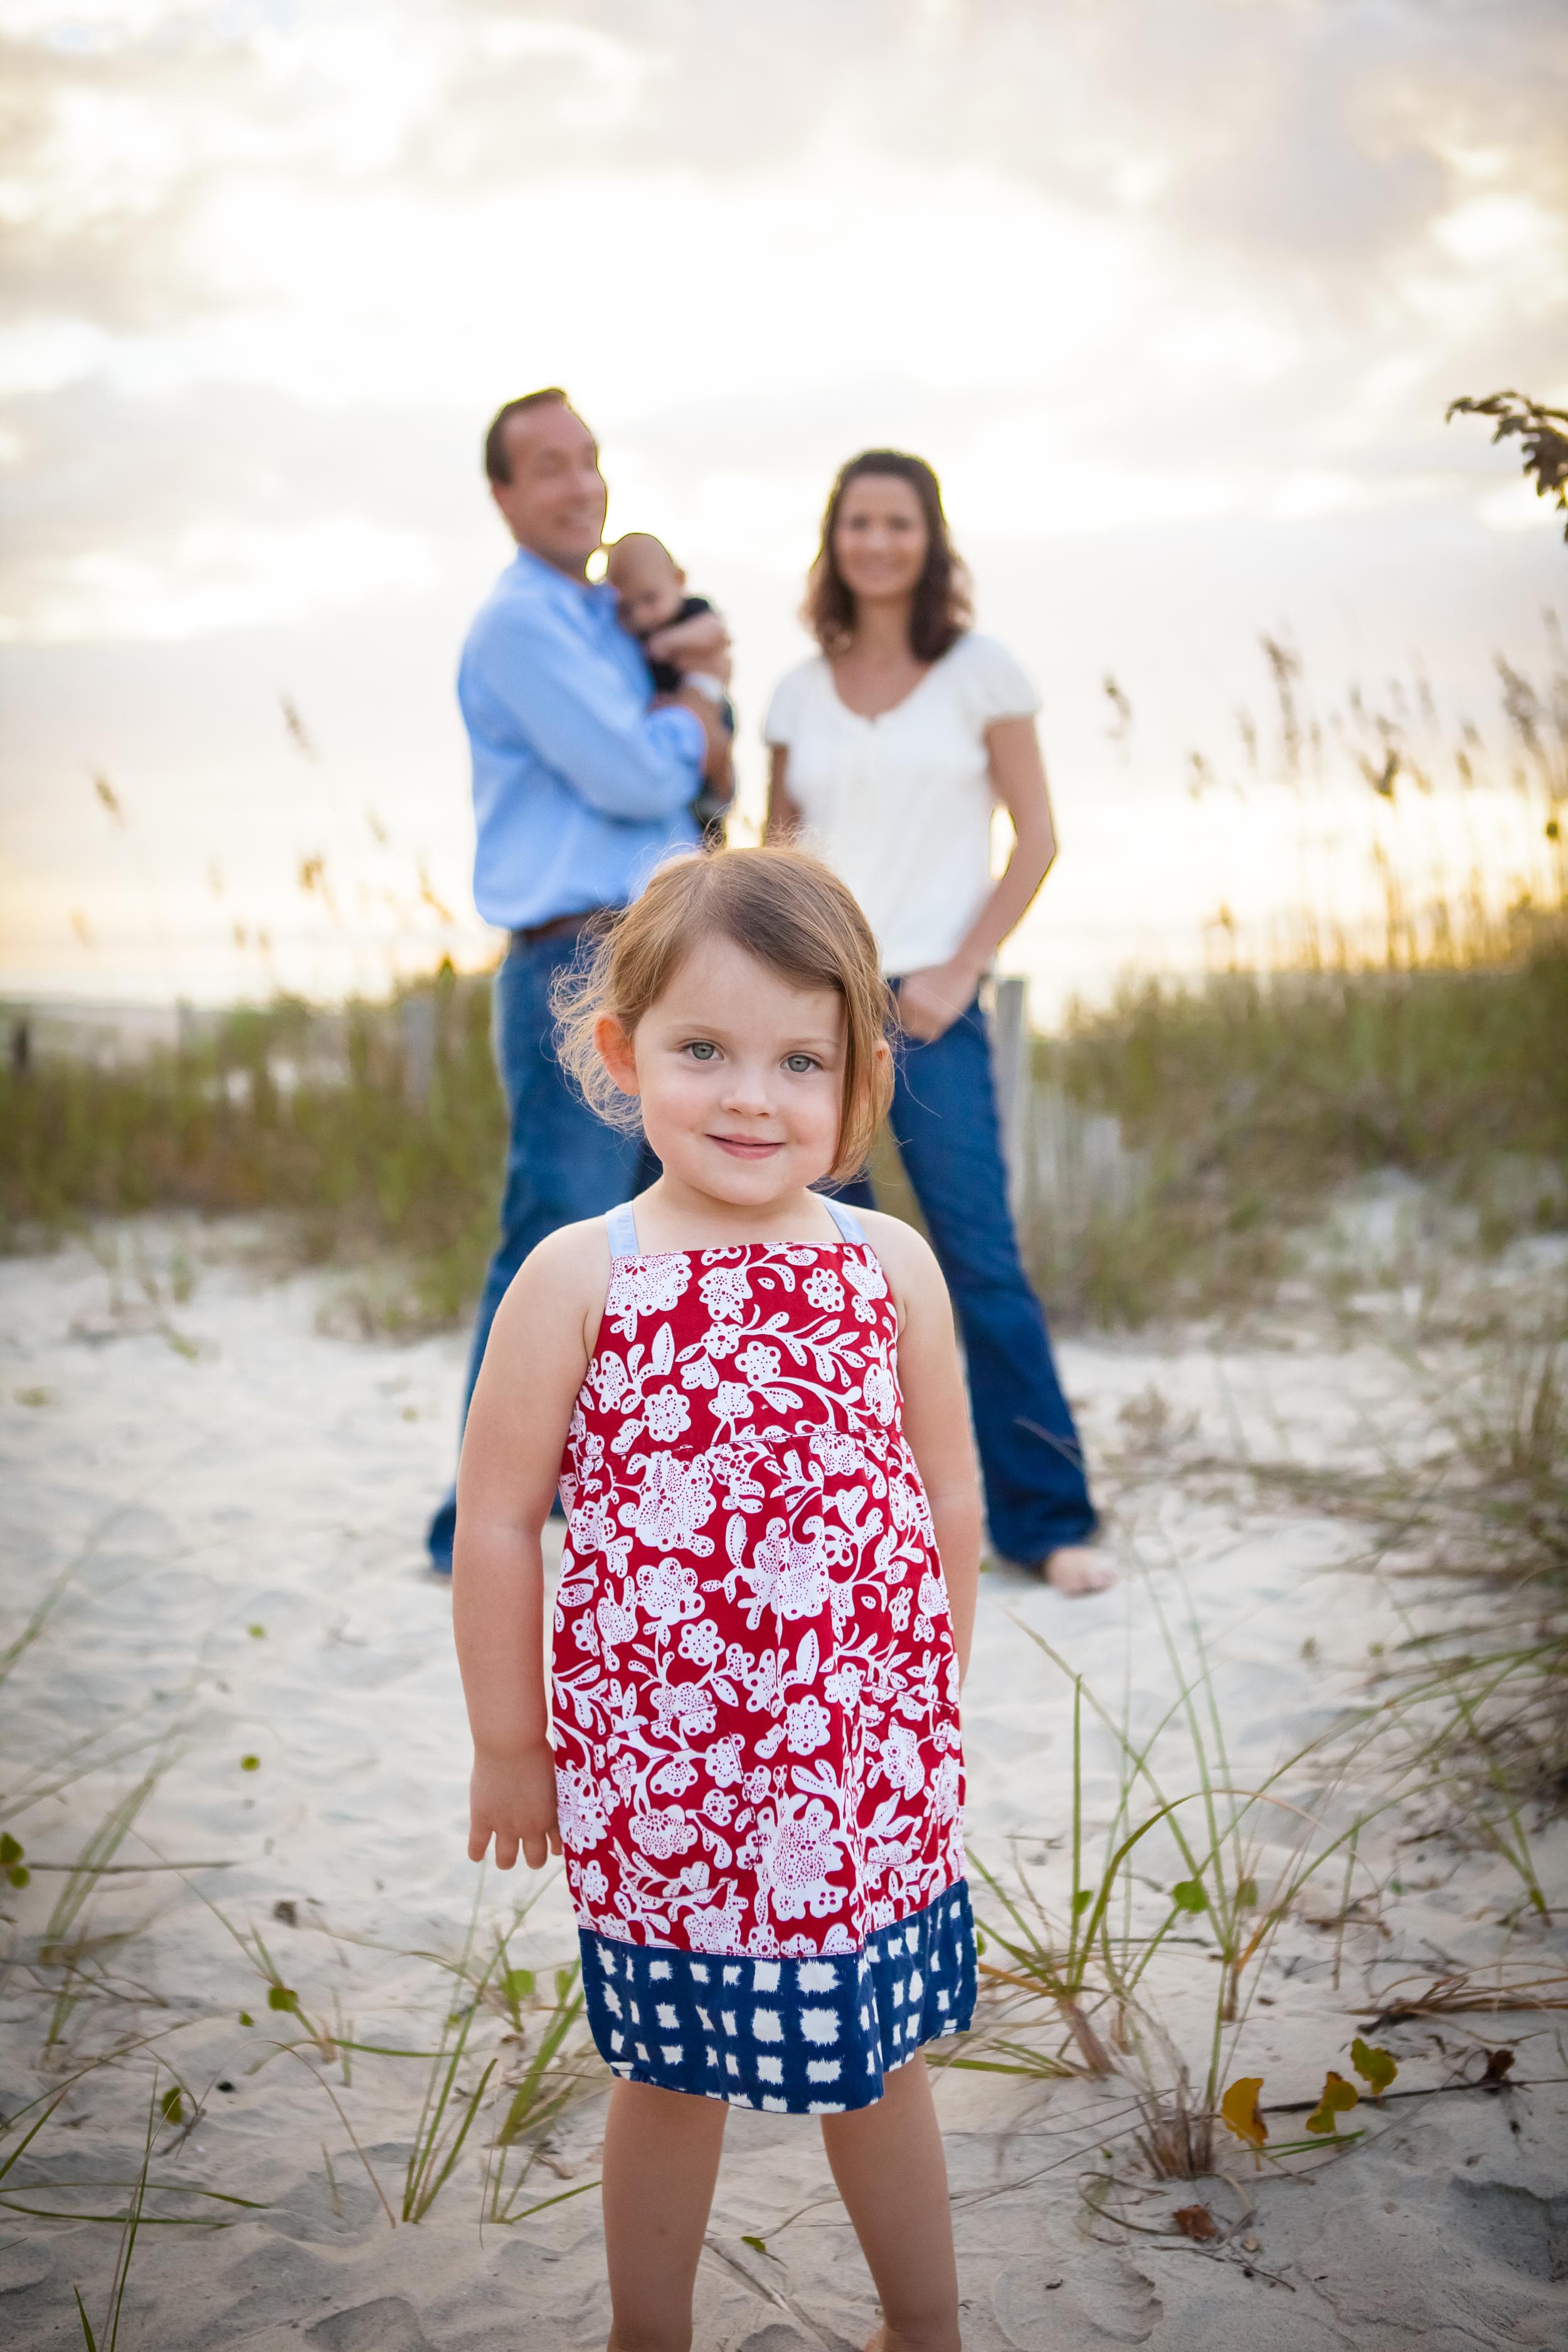 Reale-Copithorne Family Session-33.jpg